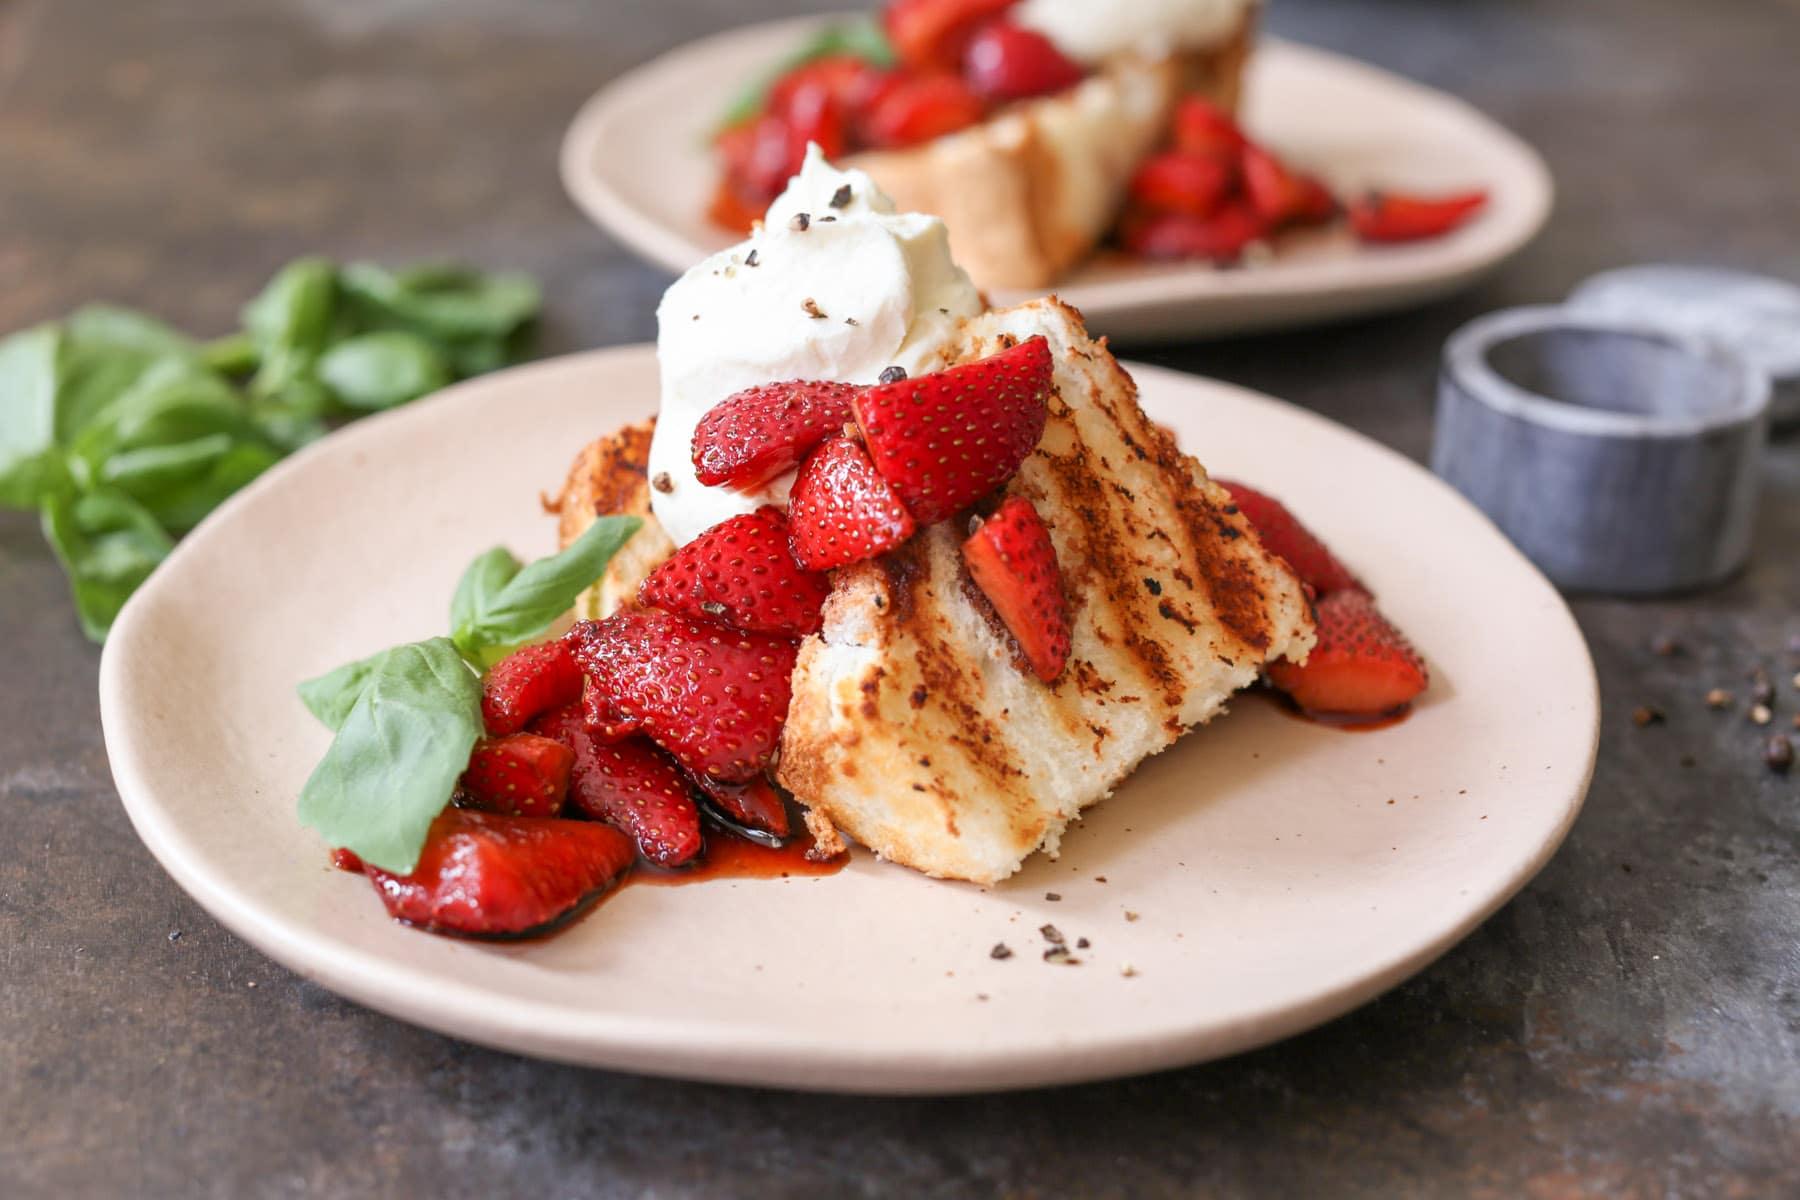 Grilled-Angel-Food-Cake-Whipped-Mascarpone-Balsamic-Strawberries-6